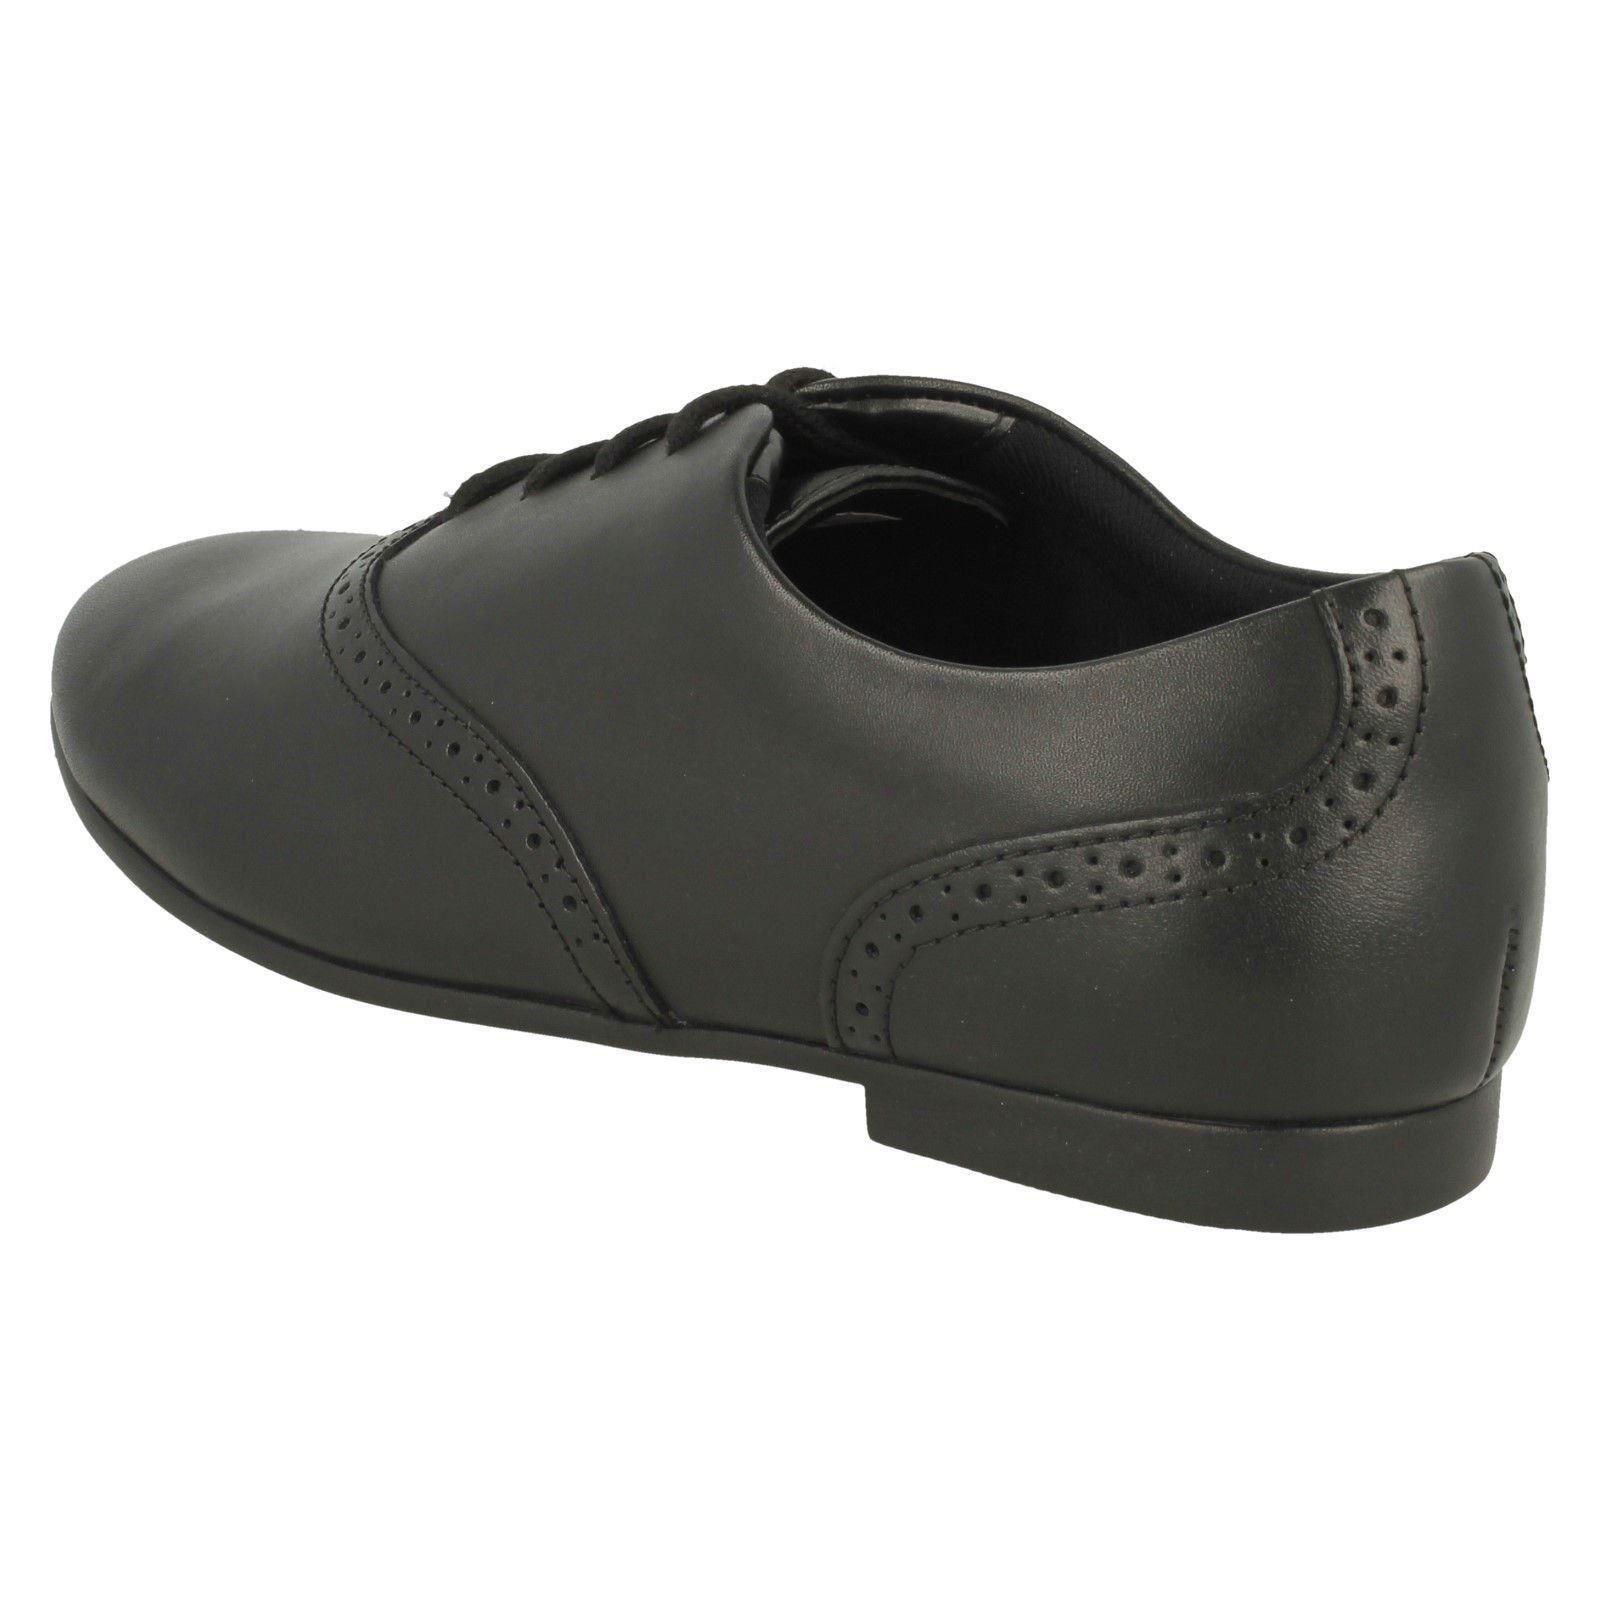 punta redondeada para de Walk' escolares Zapatos 'jules con con niñas Clarks piel Negro cordones qf80Zgw